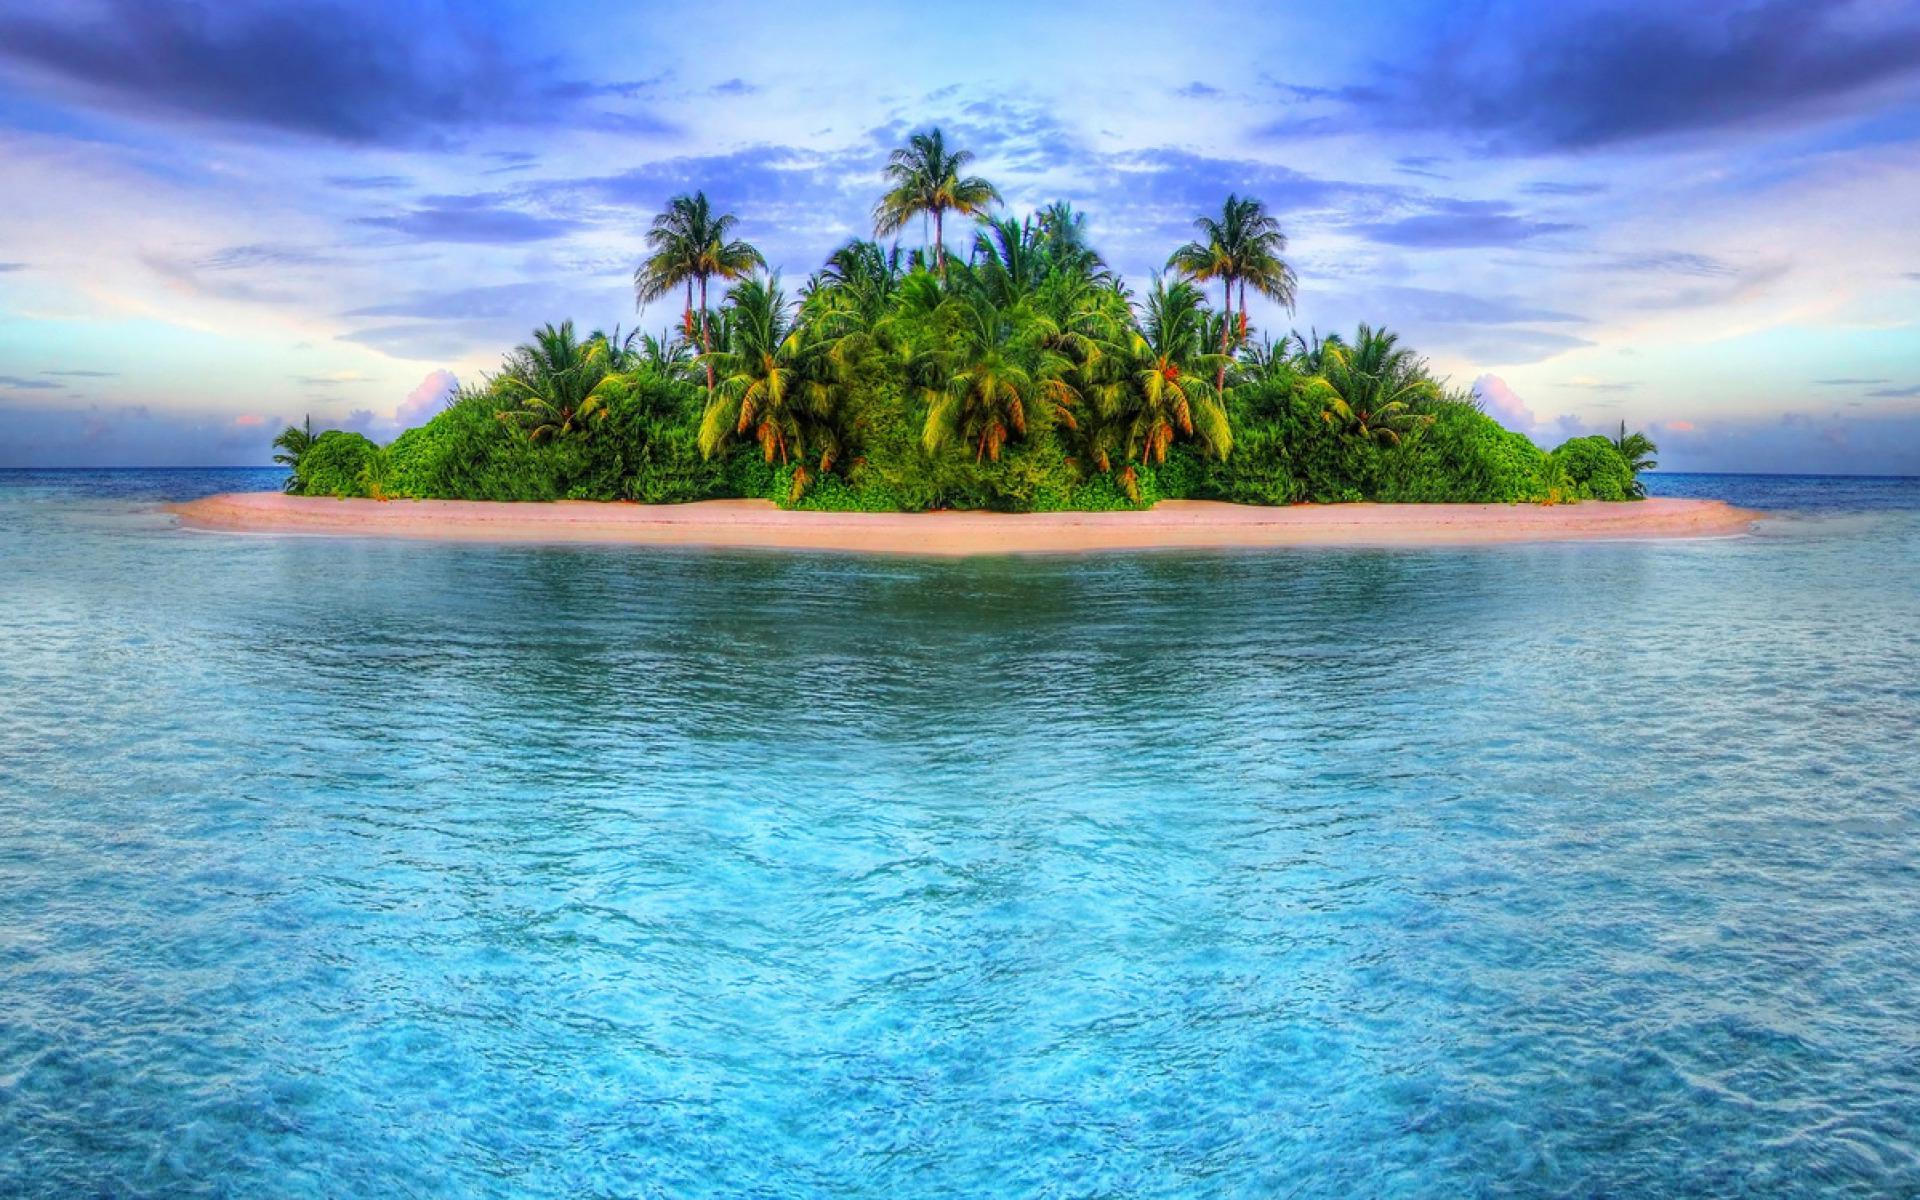 tropical islands wallpaper wallpapersafari. Black Bedroom Furniture Sets. Home Design Ideas